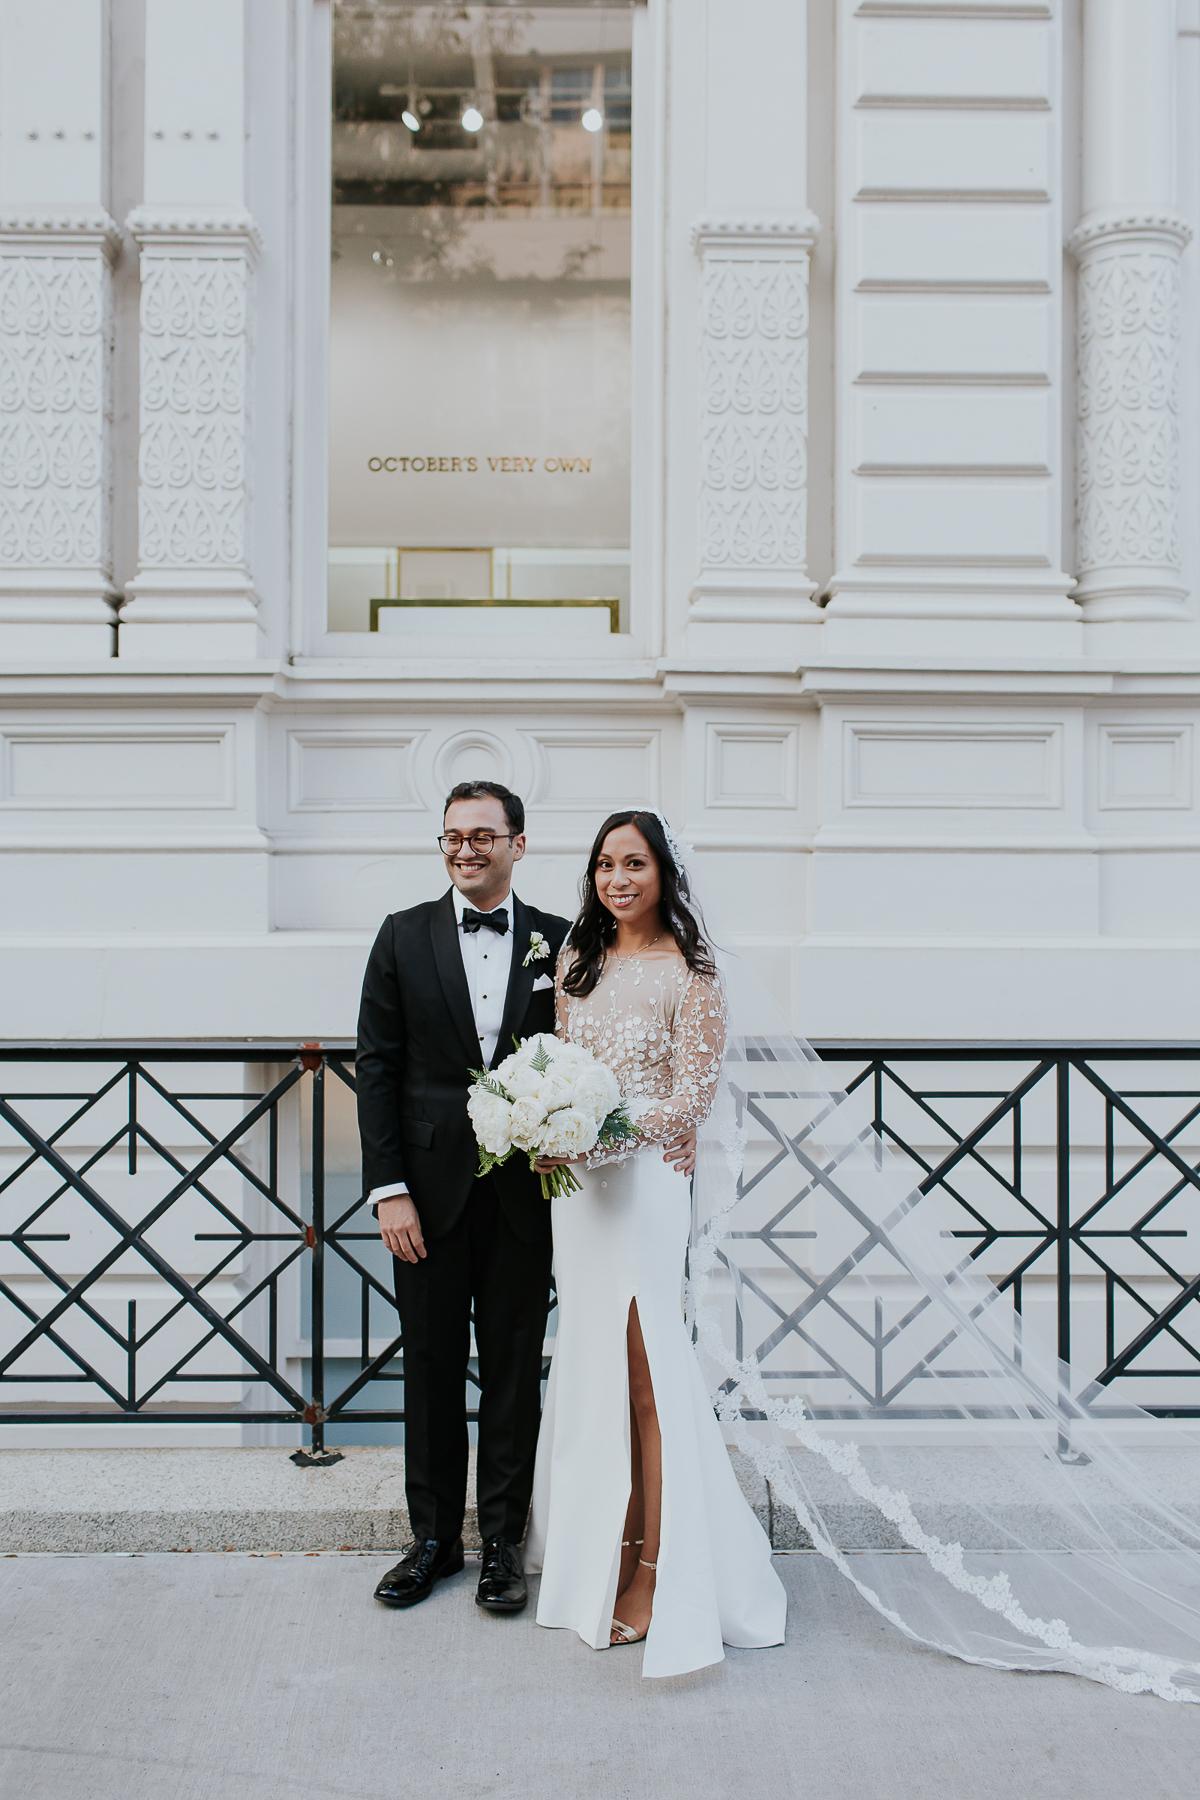 Bowery-Hotel-NYC-Documentary-Wedding-Photos-56.jpg